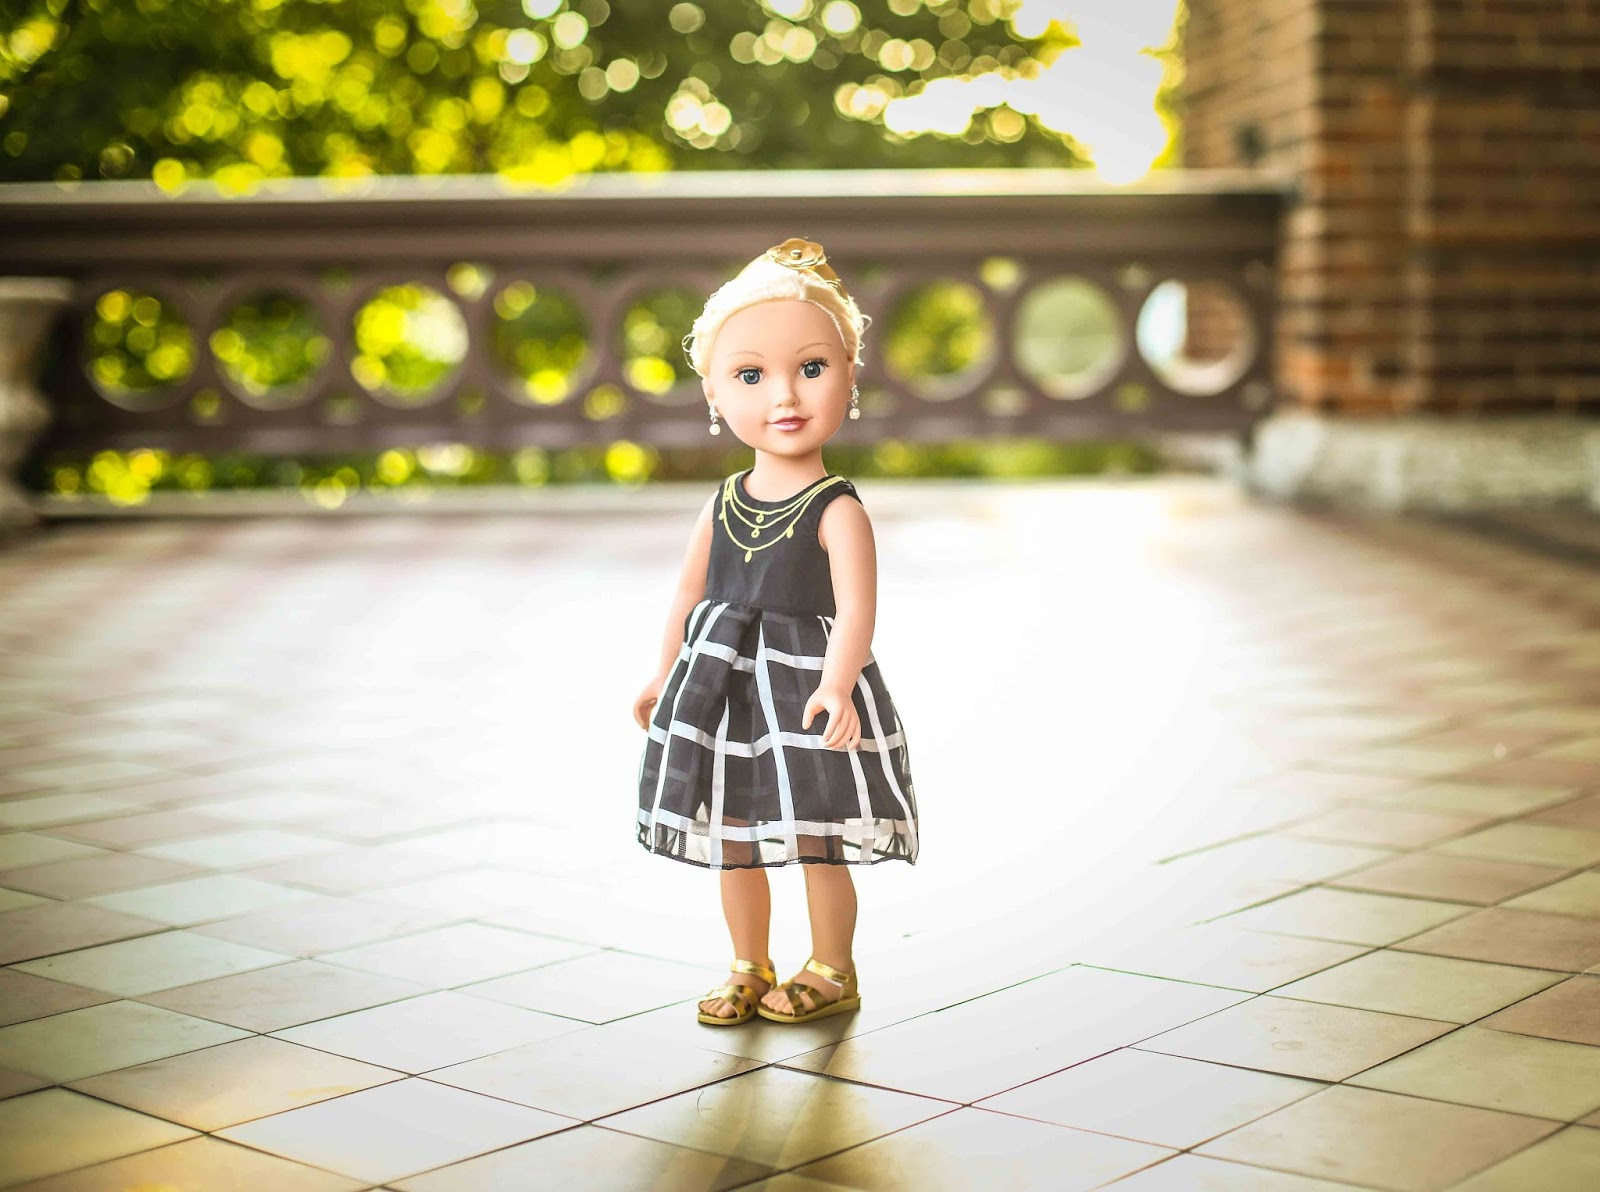 My Journey Girls Dolls Adventures | Journey girl dolls